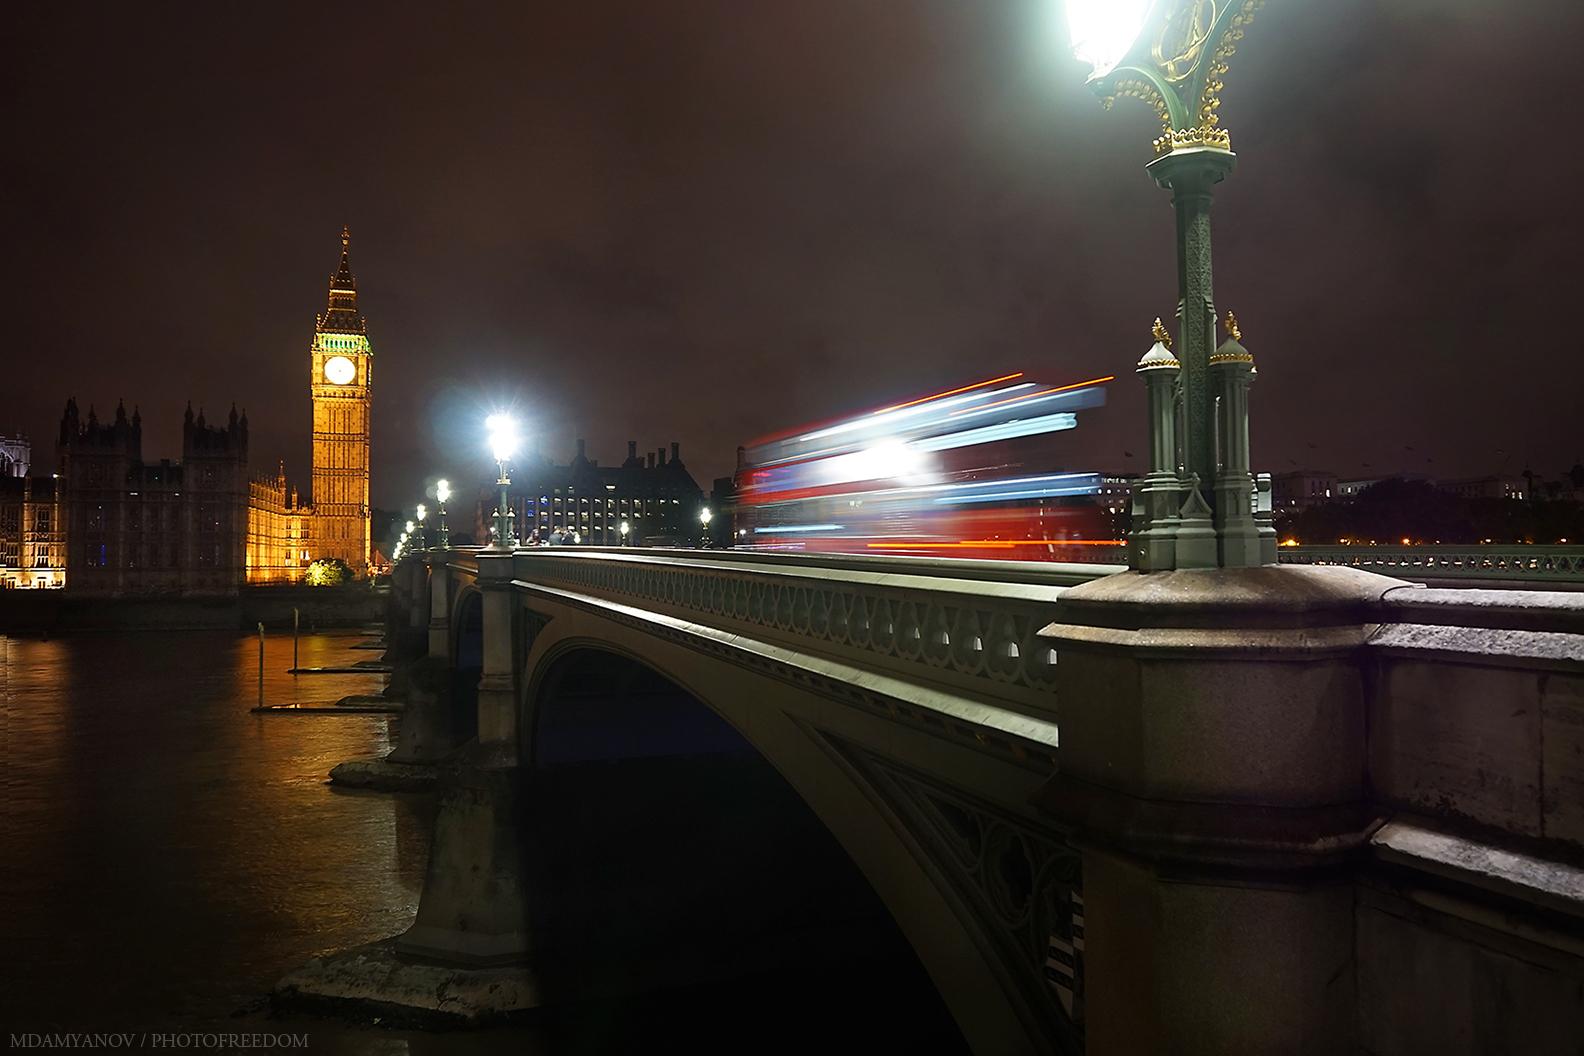 Westminster Bridge   Author mdamyanov  - mdamyanov   PHOTO FORUM